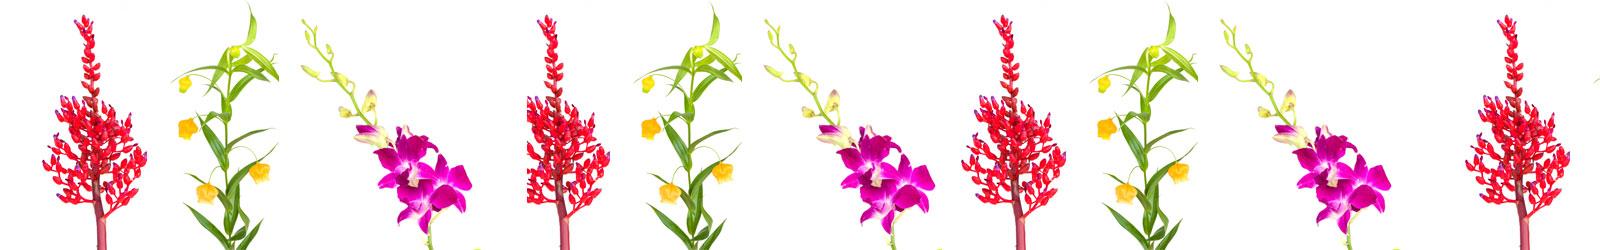 bloemenfee-assortiment